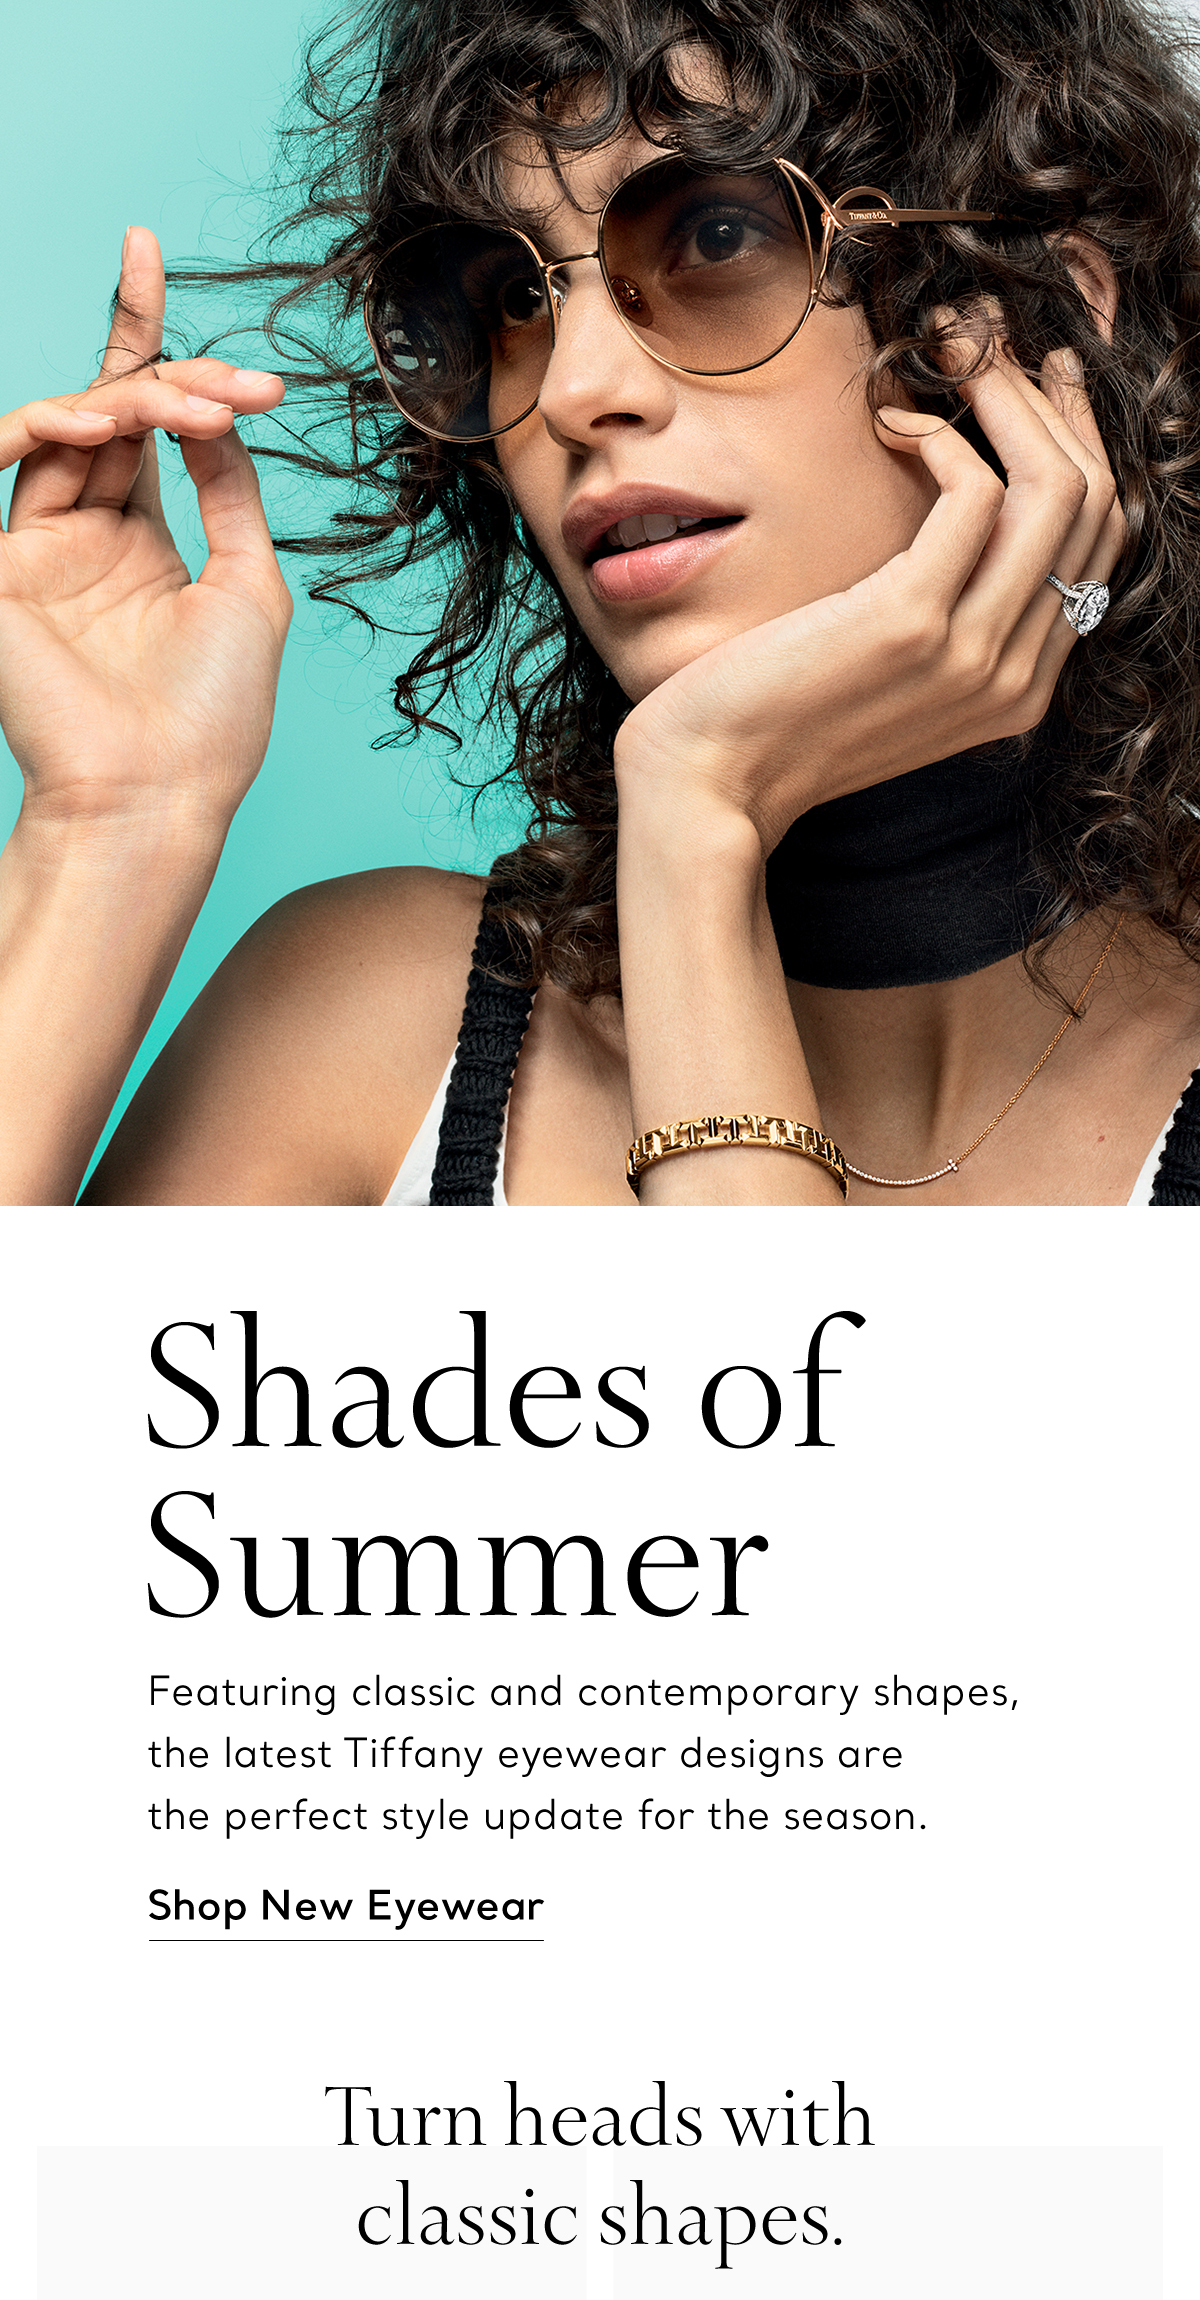 Shop New Eyewear